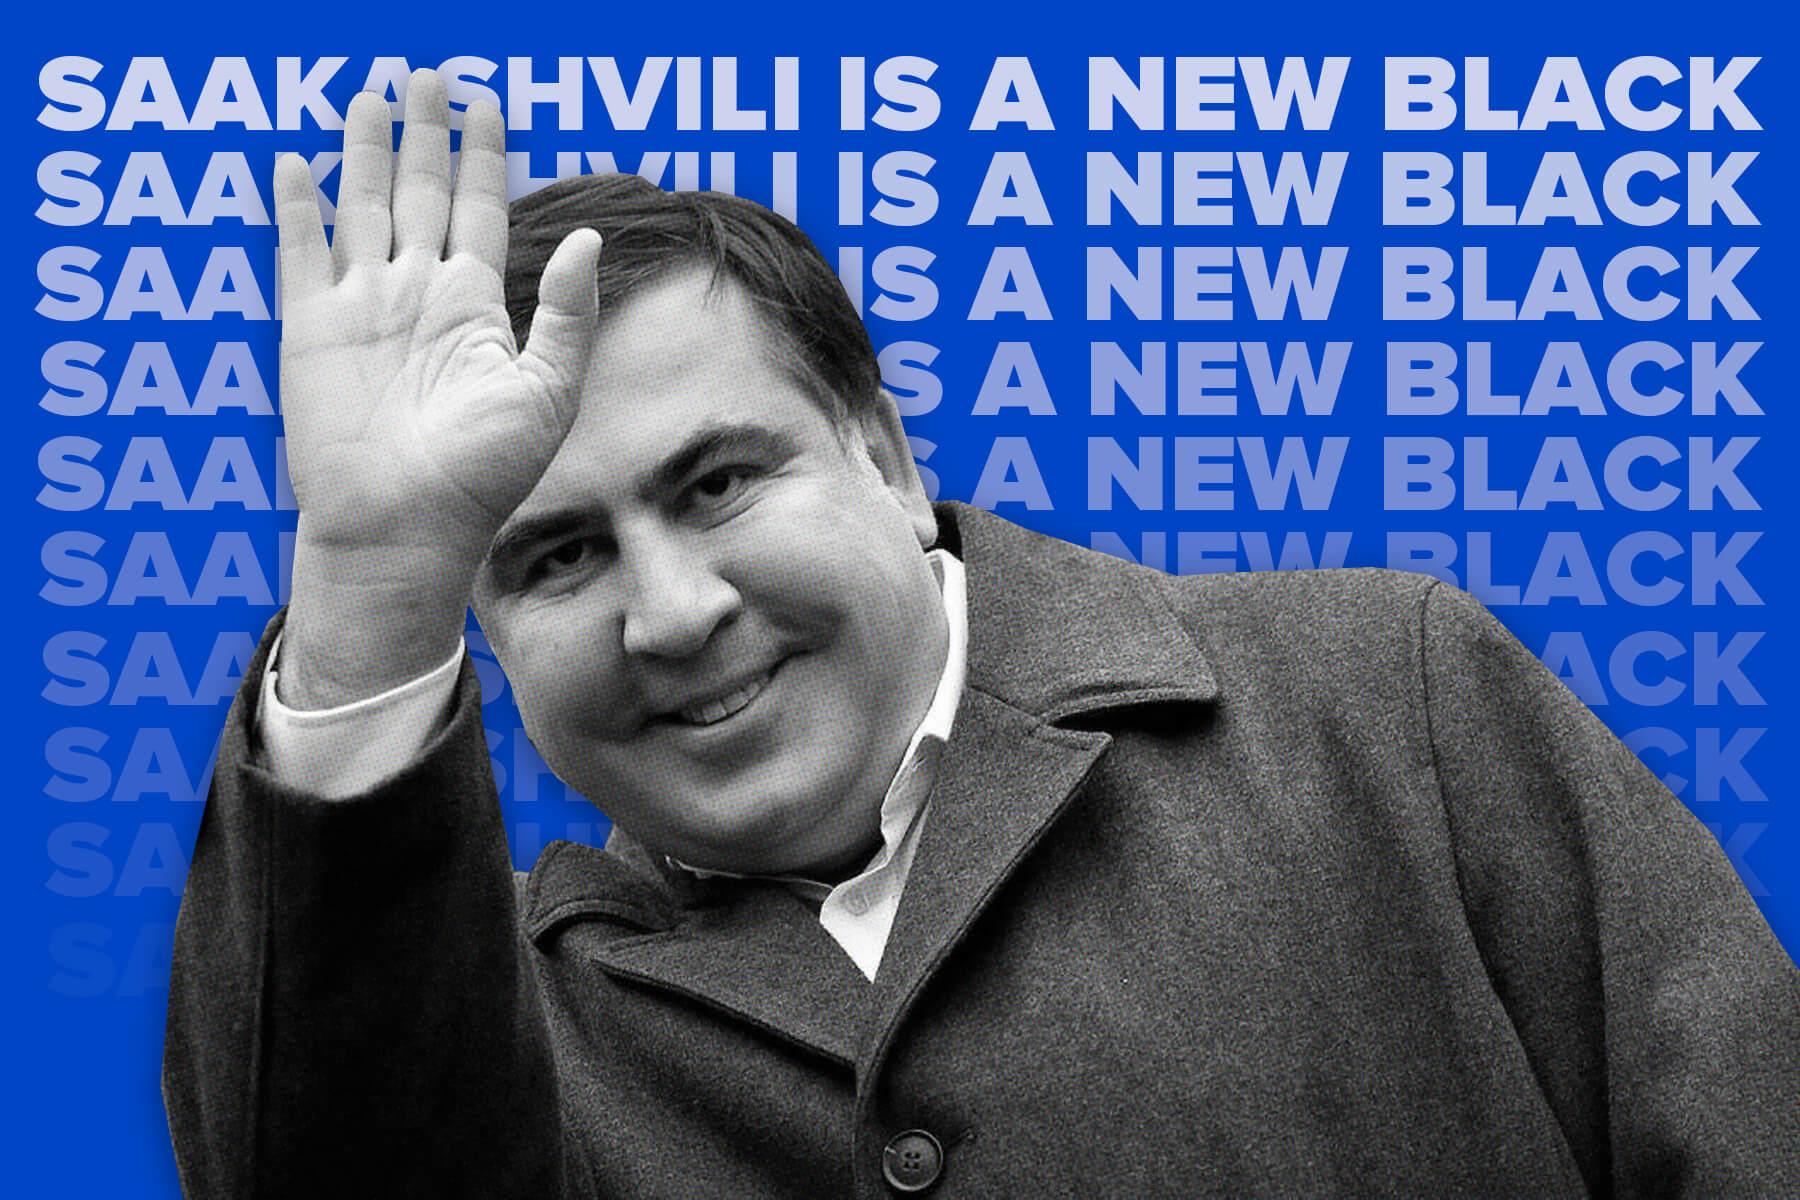 Міхеїл Саакашвілі знову в українській політиці?